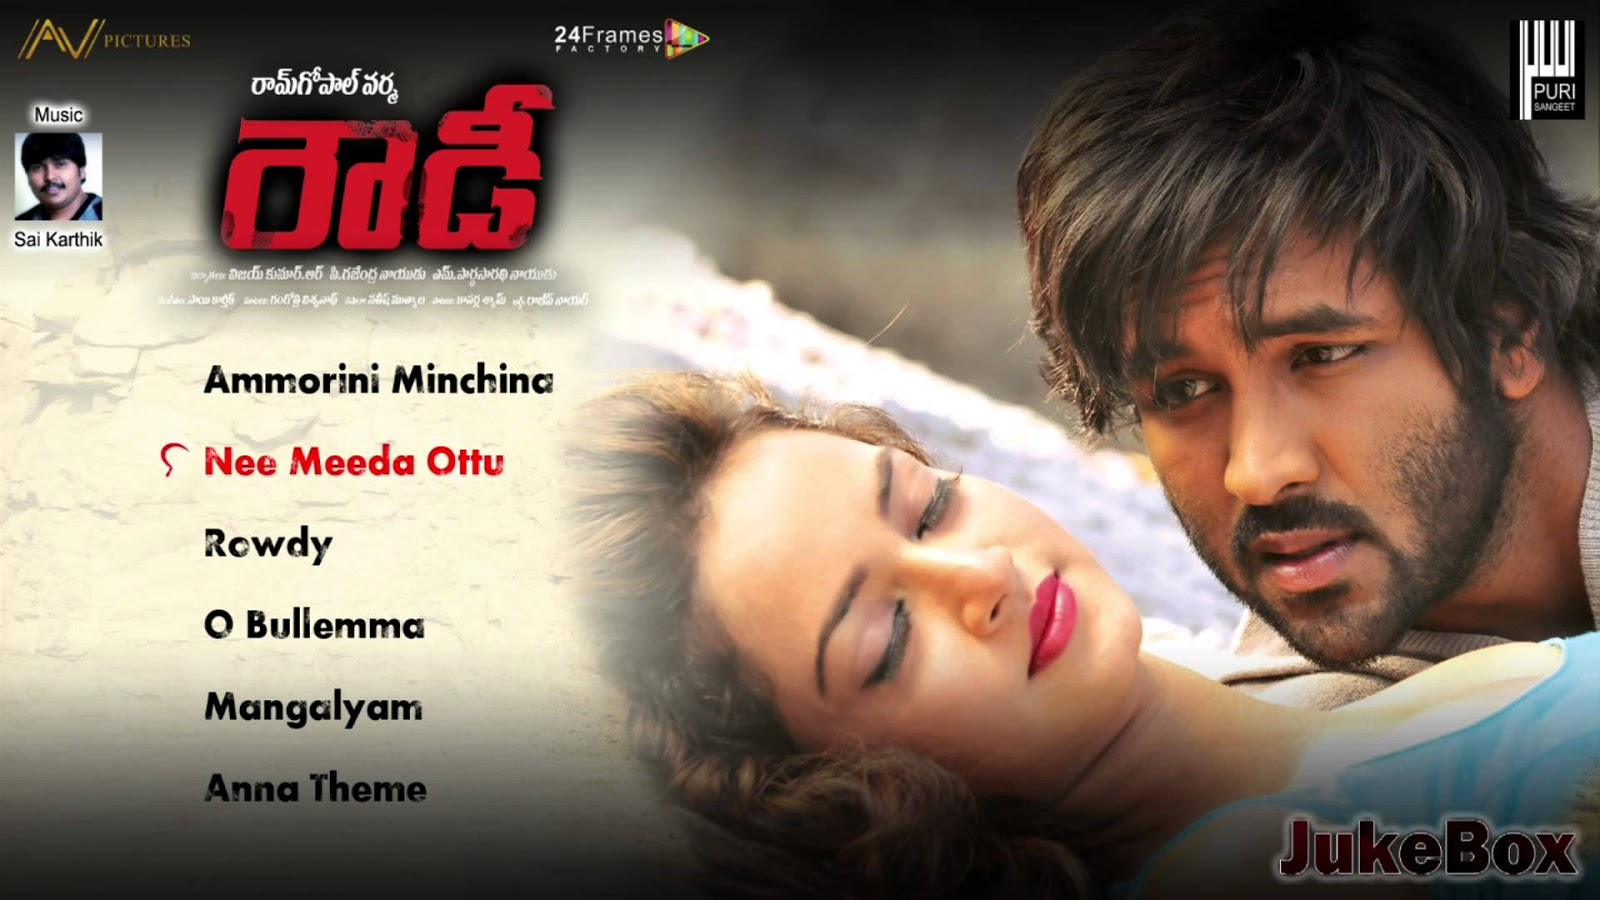 Bollywood HD Mp4 Movies Bollywood 3GP Movies - muzzmije-mp3